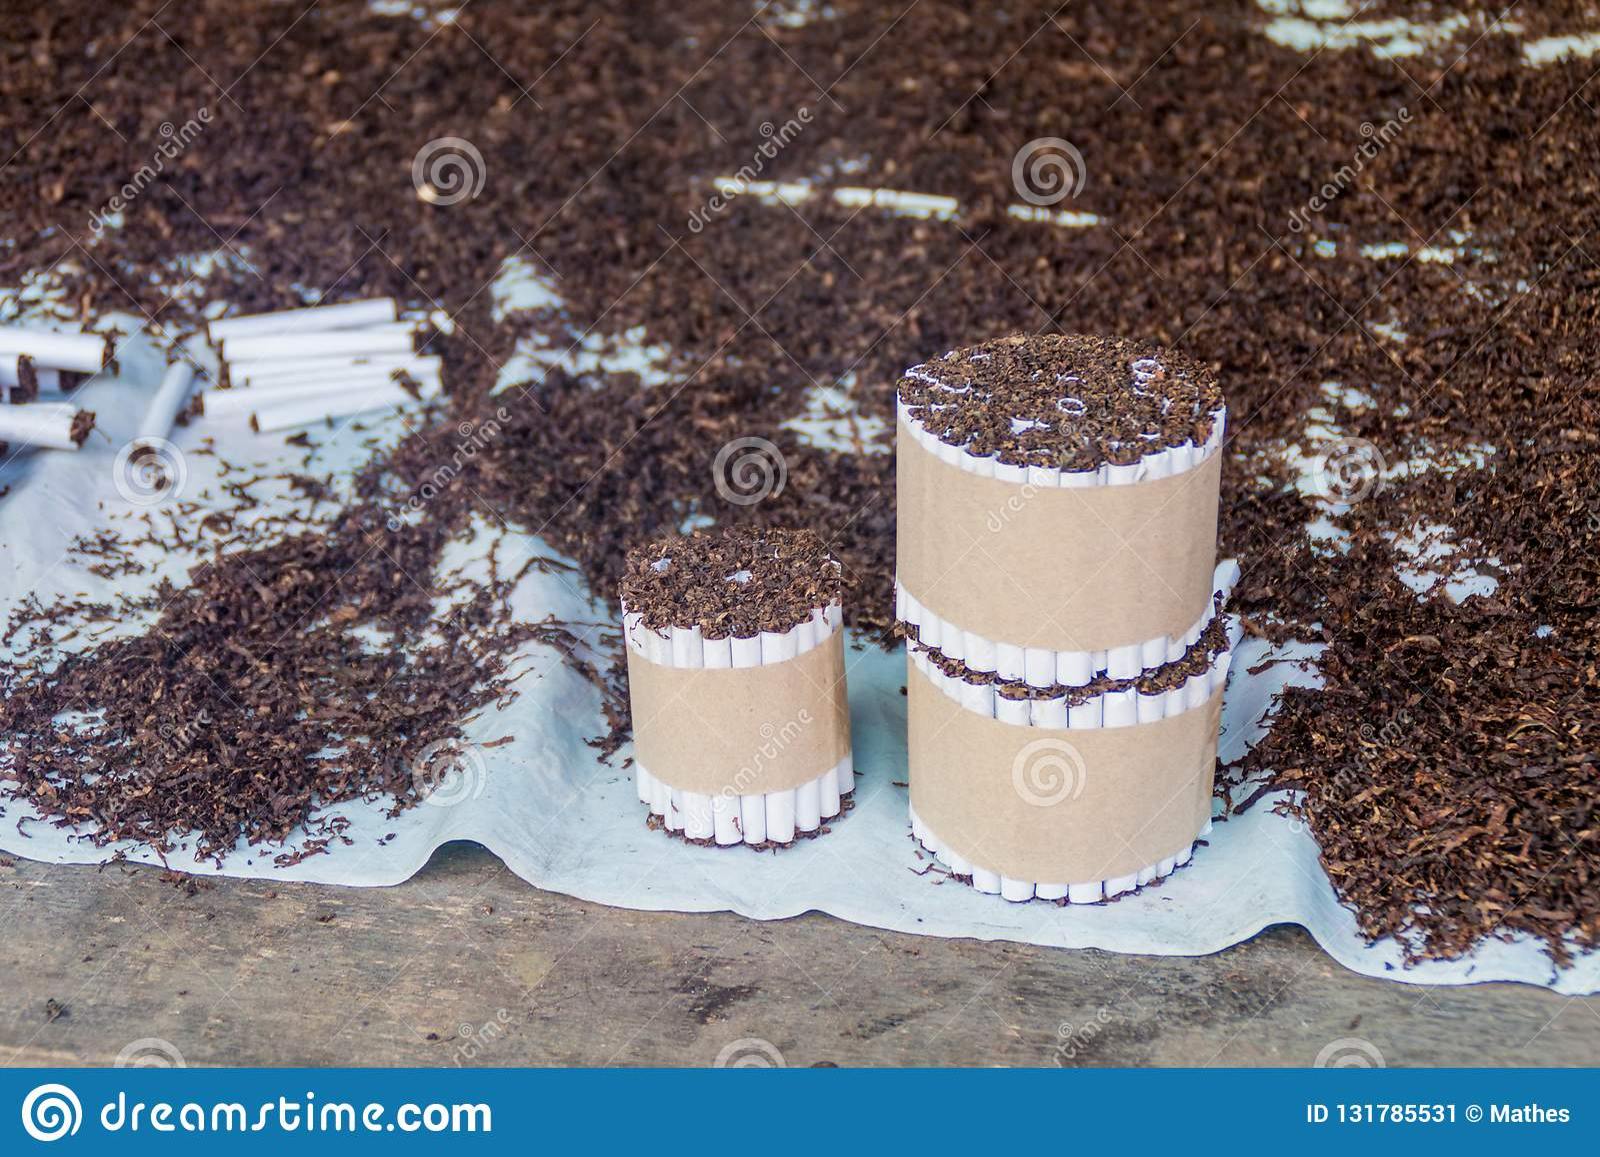 Handmade cigarettes